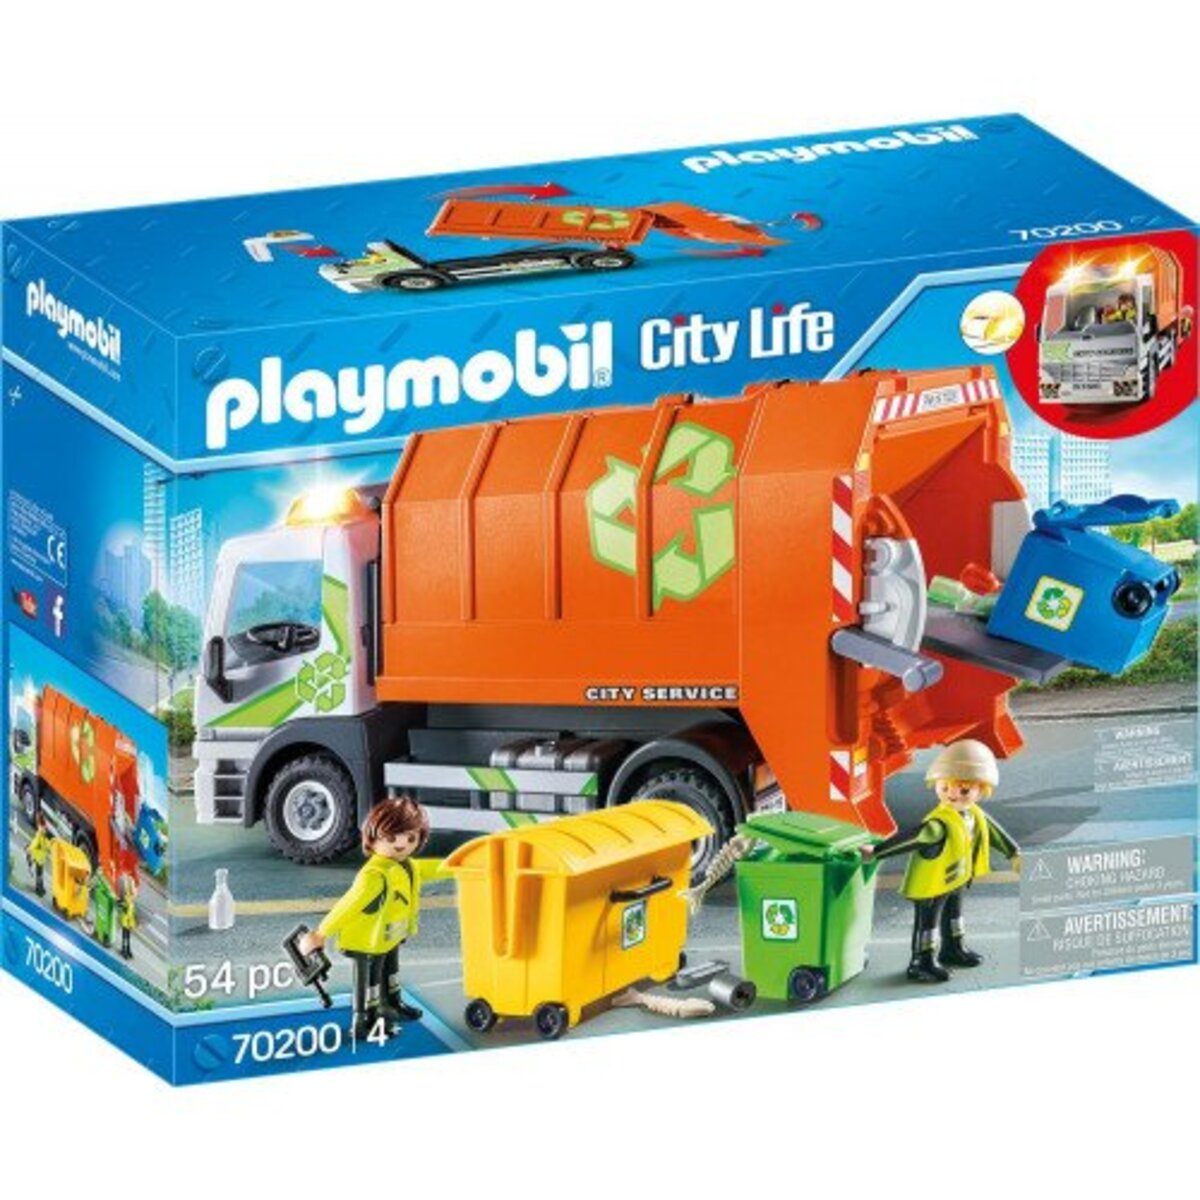 Bild 1 von PLAYMOBIL 70200 Müllfahrzeug